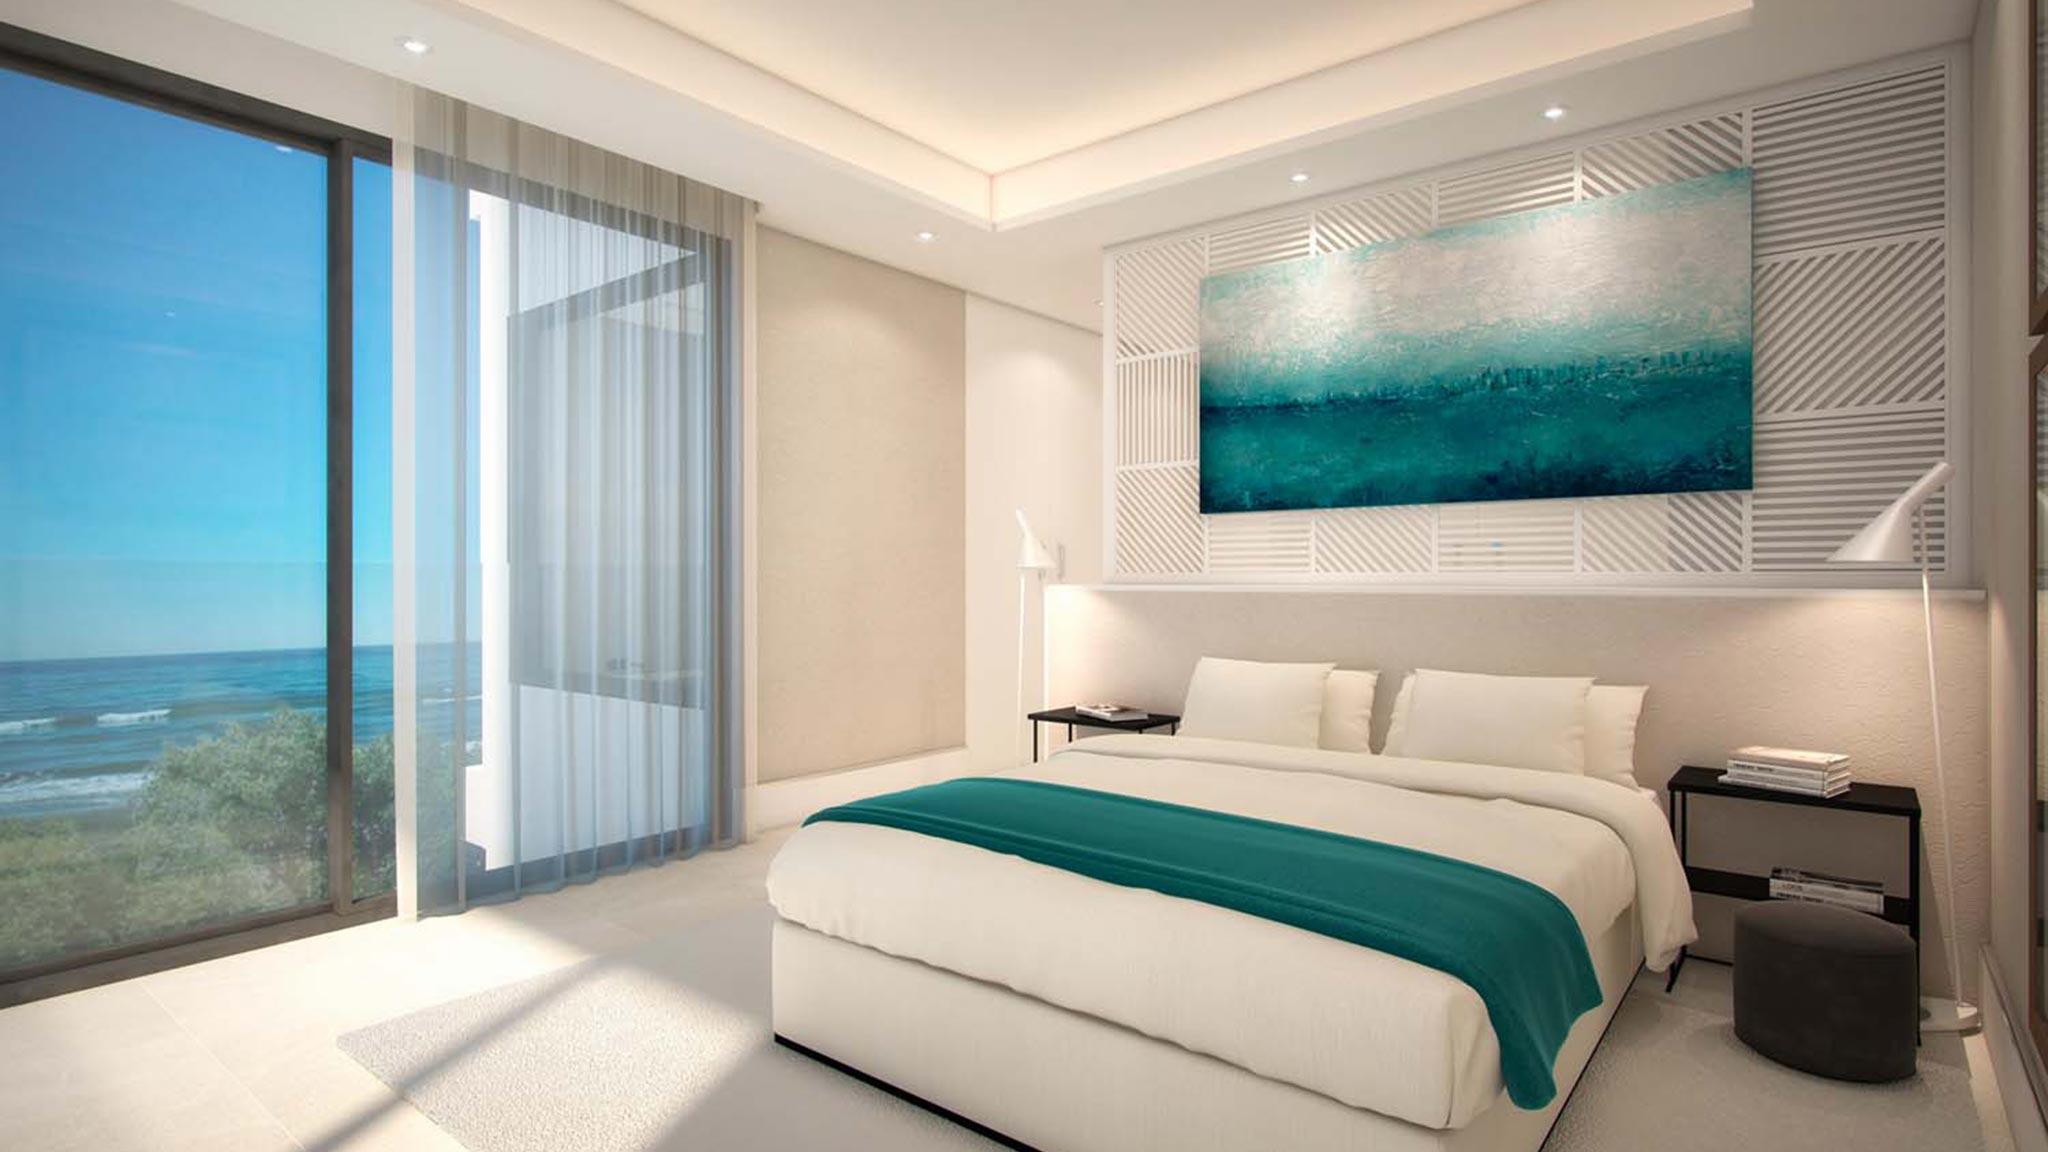 AVS01145-Apartments-09